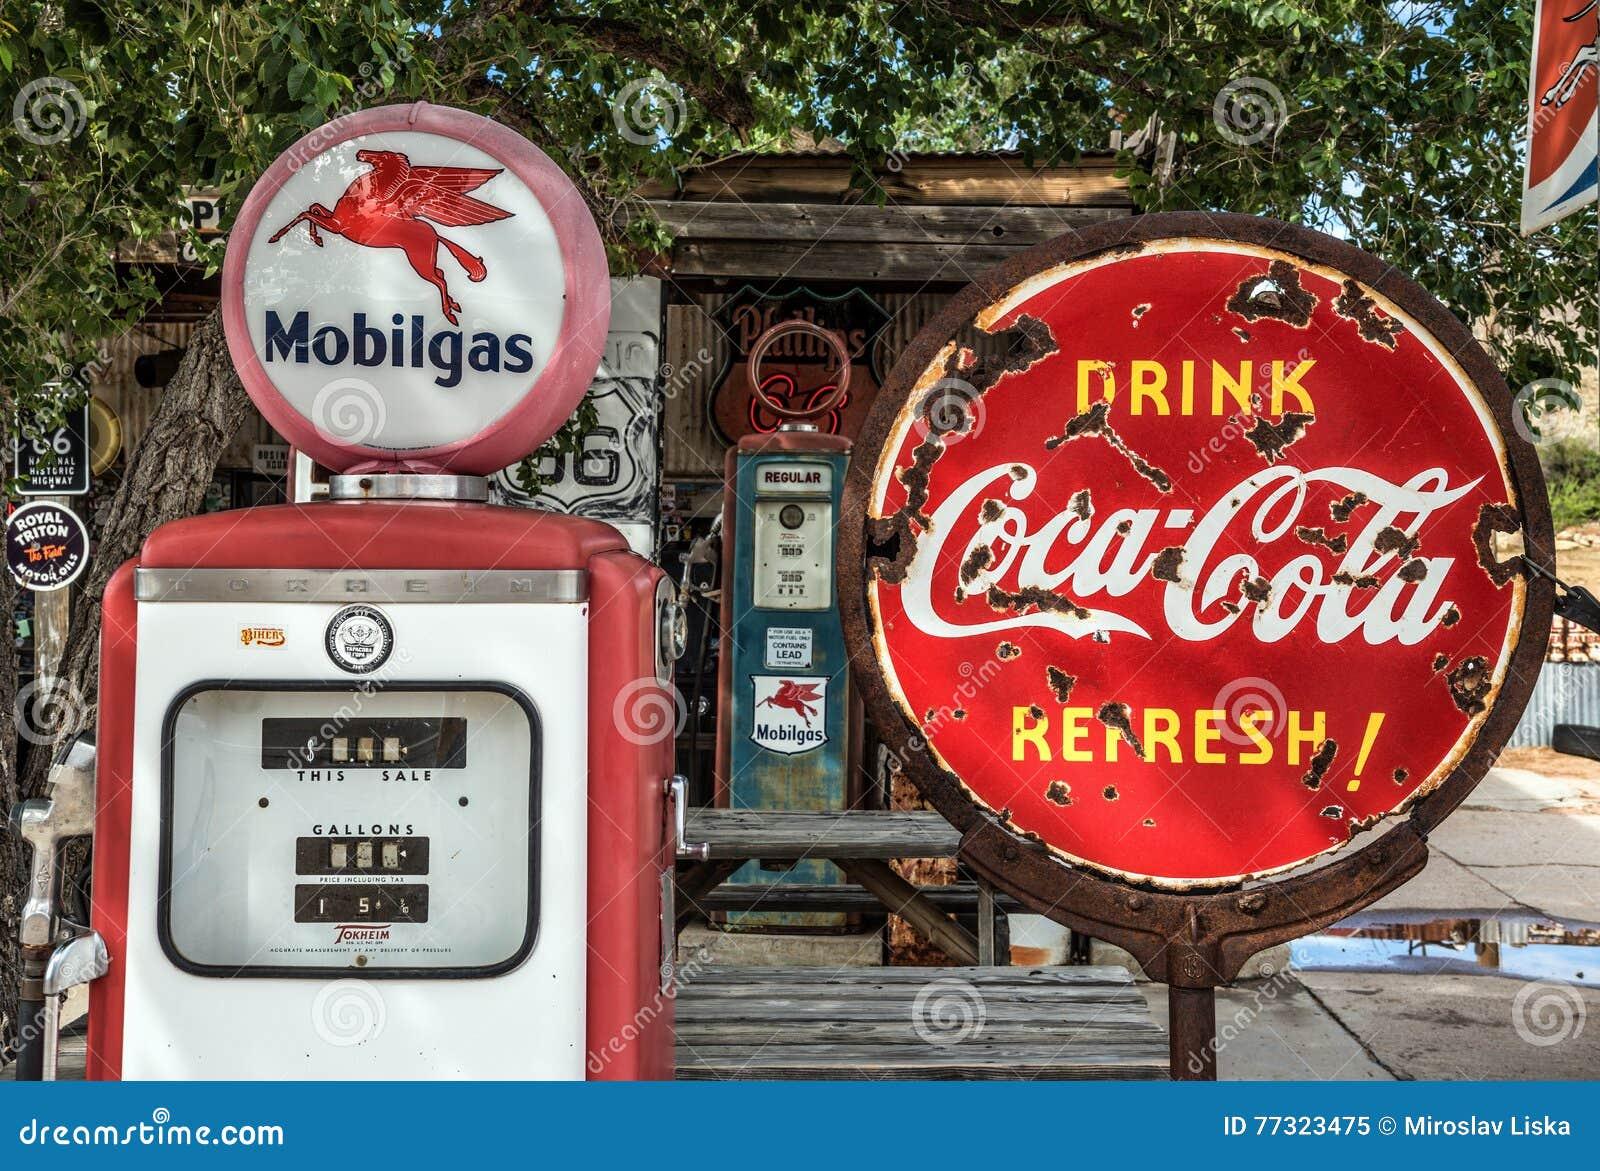 Retro Kühlschrank Cola : Kühlschrank coca cola retro ~ möbel design idee für sie u003eu003e latofu.com